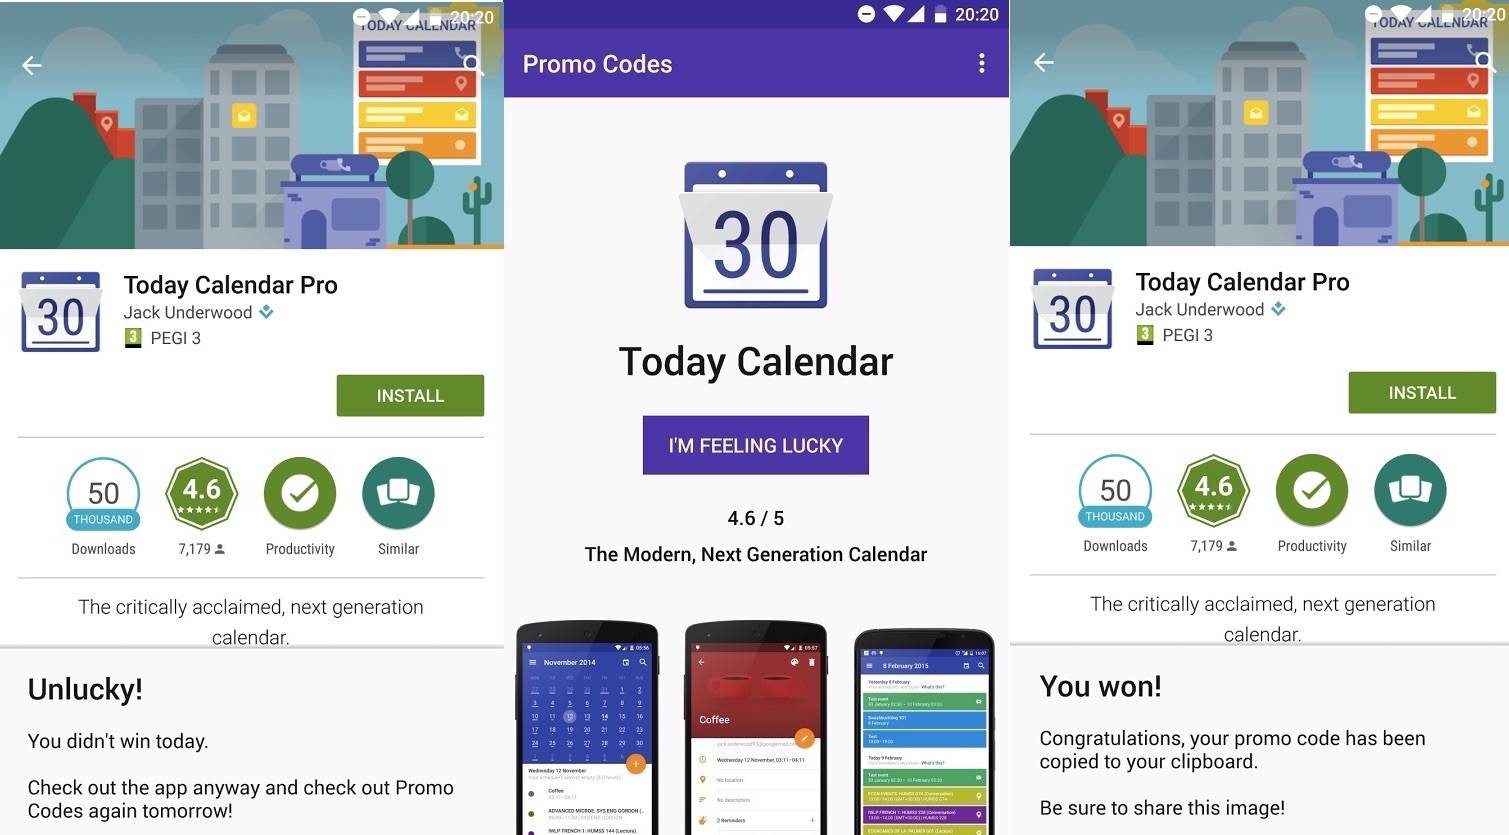 Promo Codes app